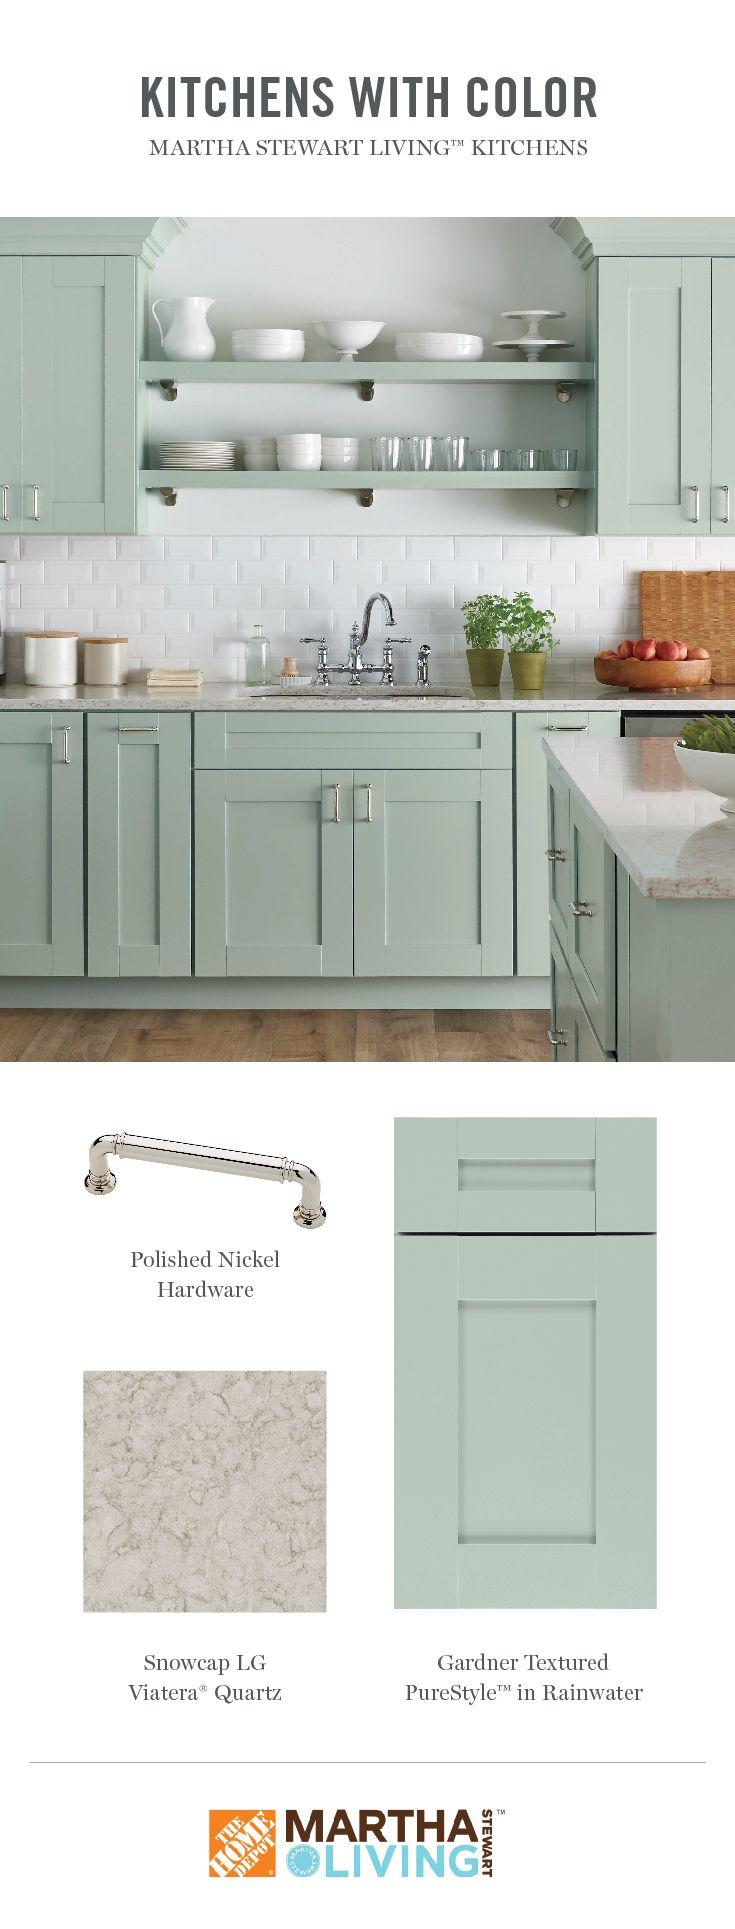 Home Depot Martha Stewart Cabinets